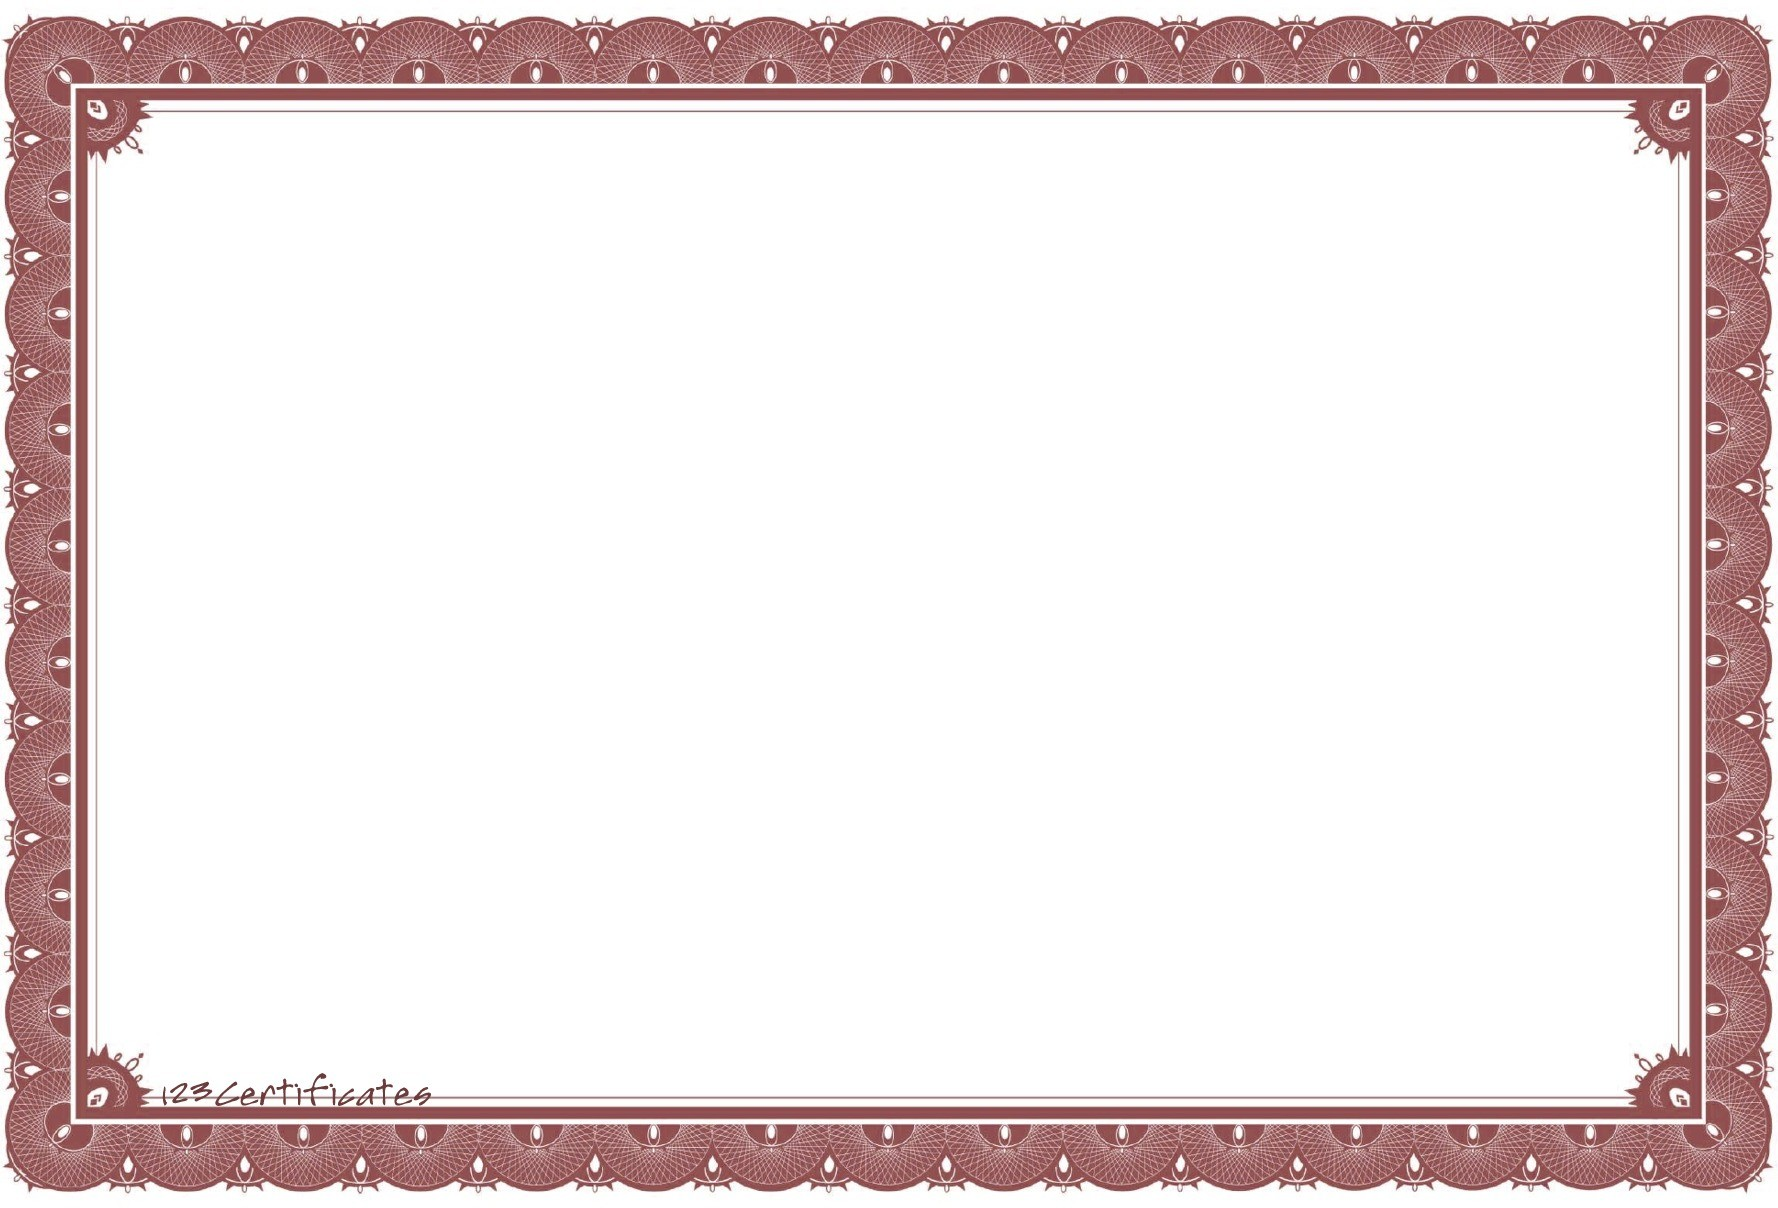 clip art borders frames download - photo #47